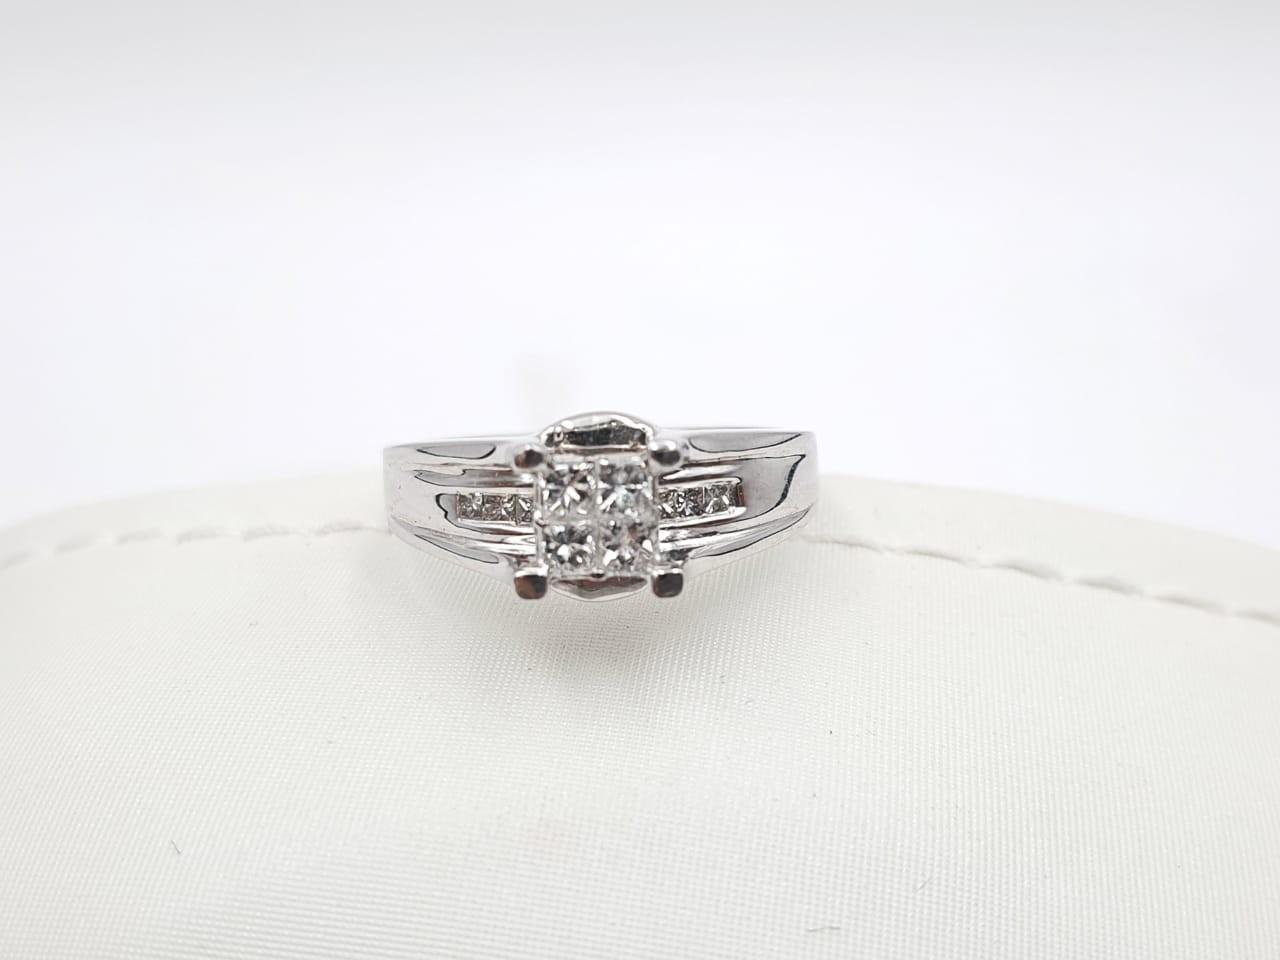 Anillo Compromiso Oro Blanco Con Diamante Cuadrado